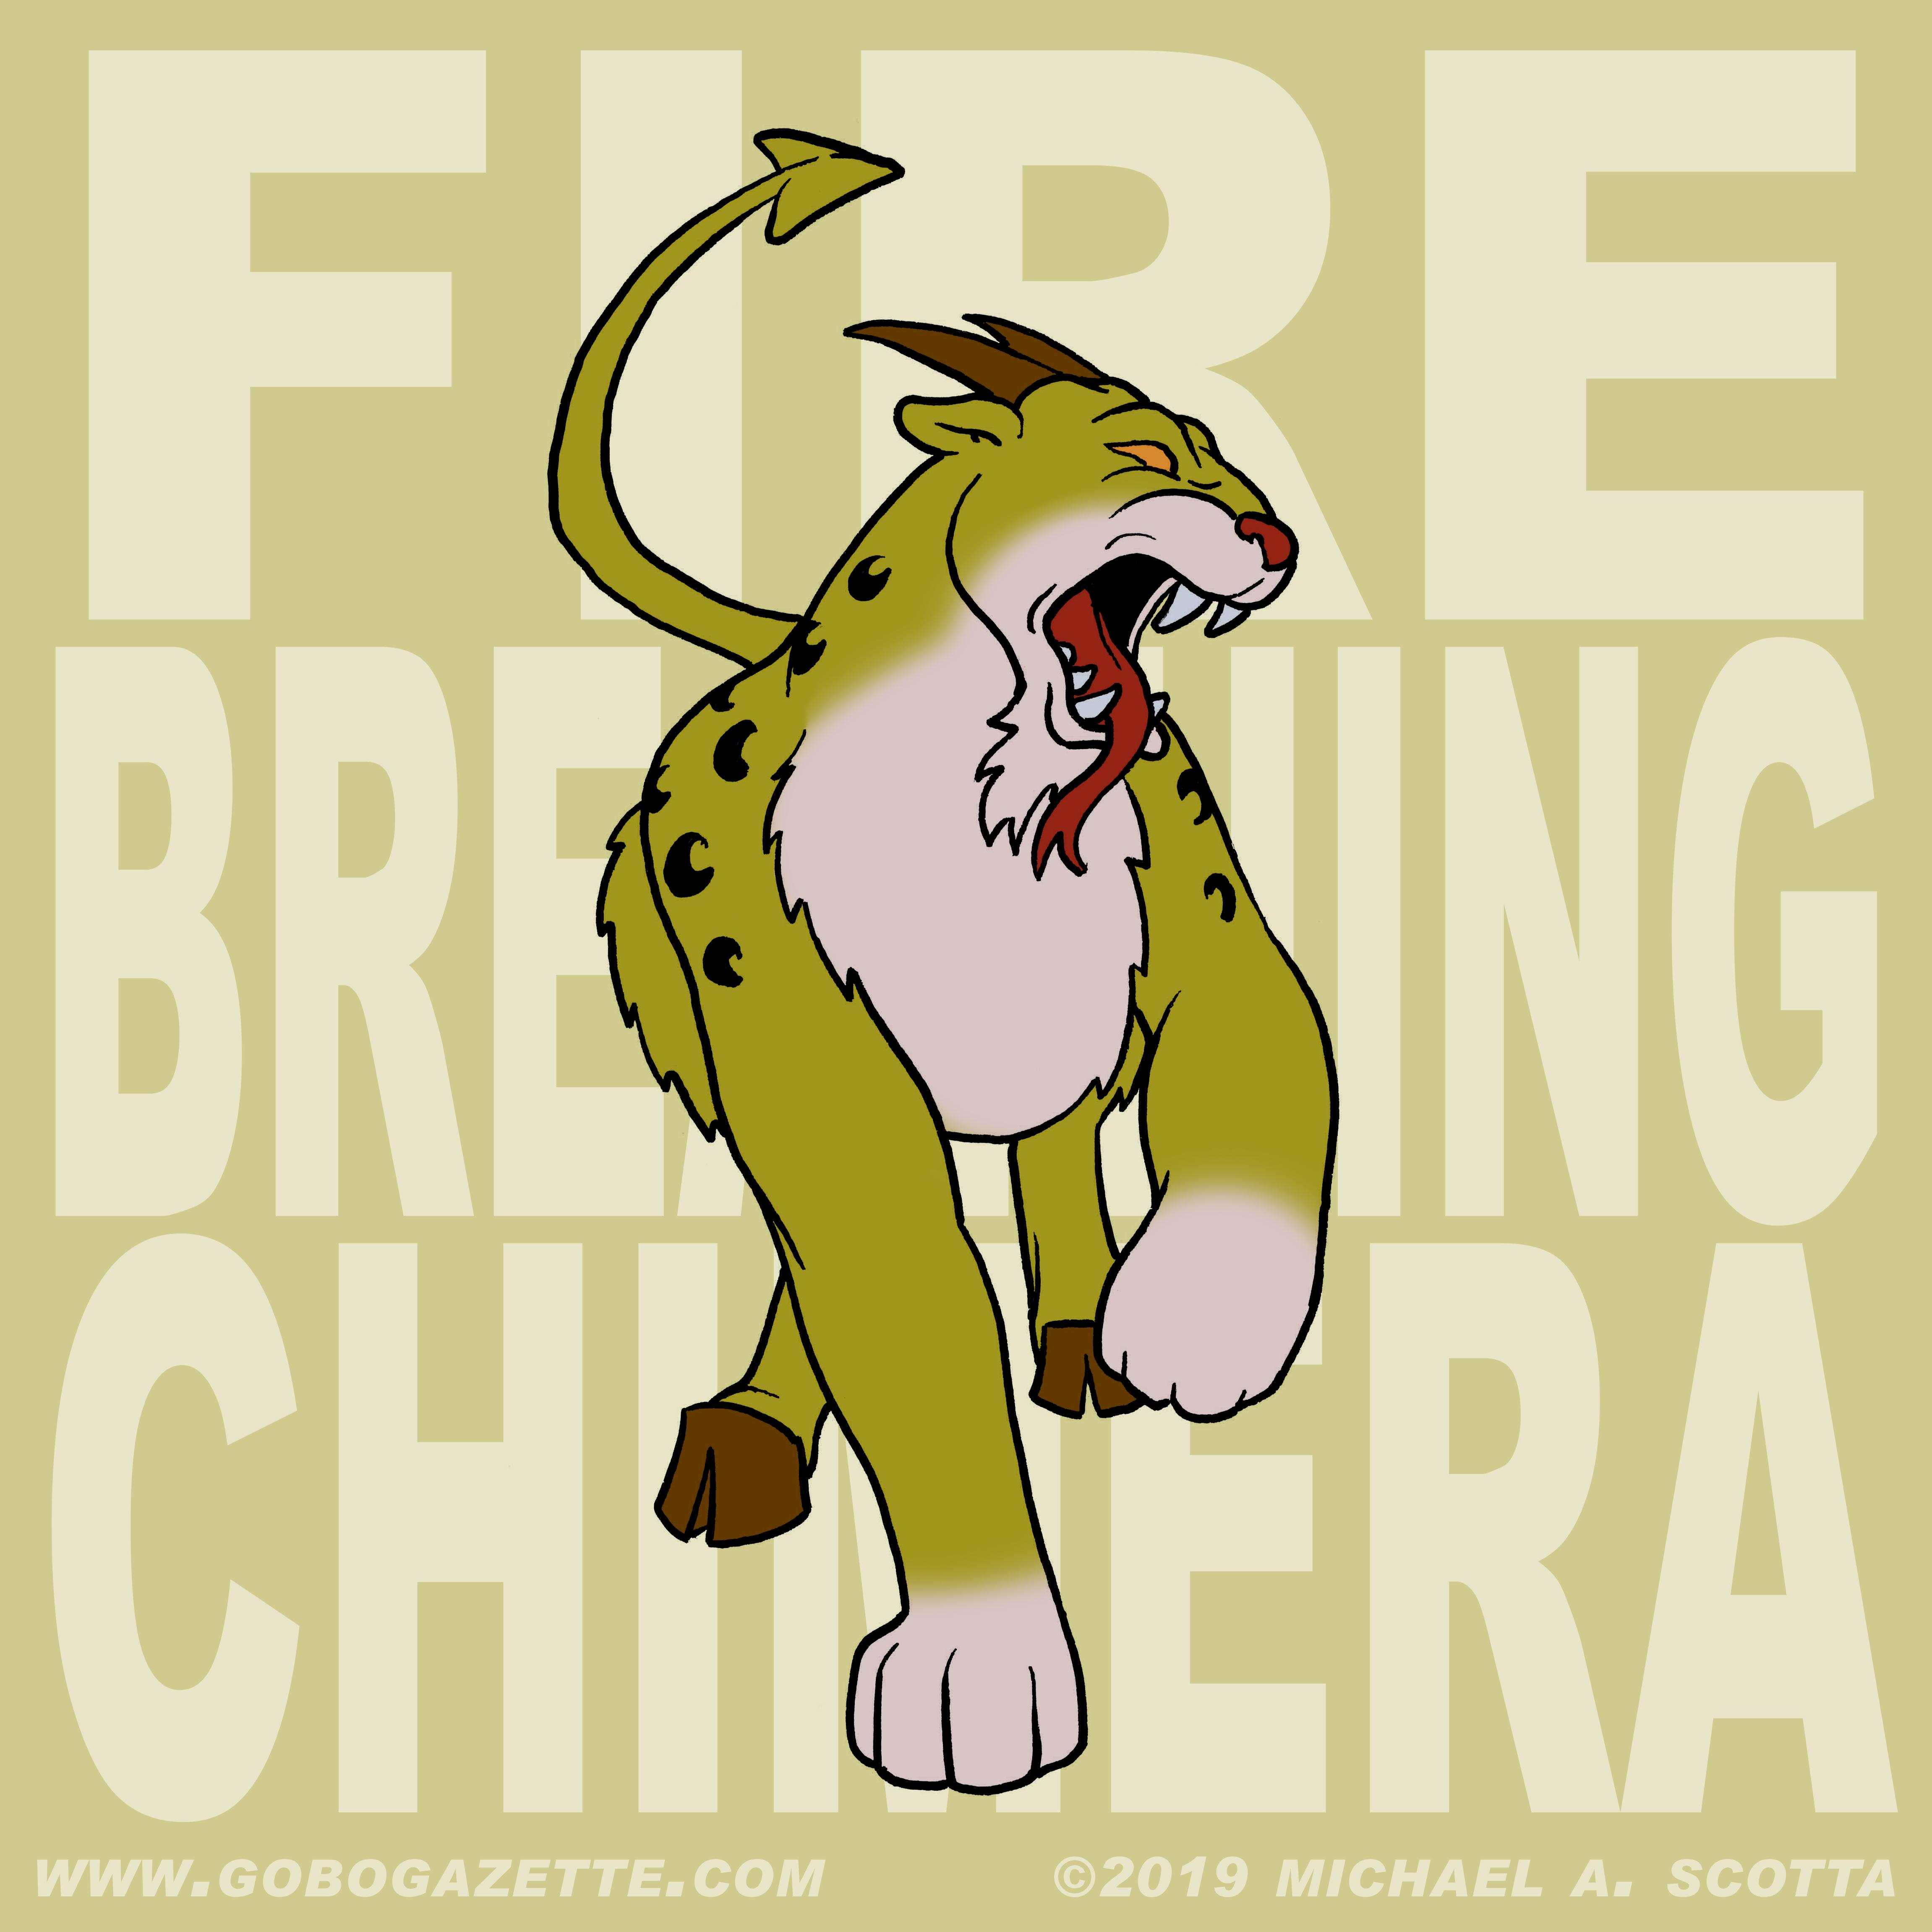 Fire Breathing Chimera